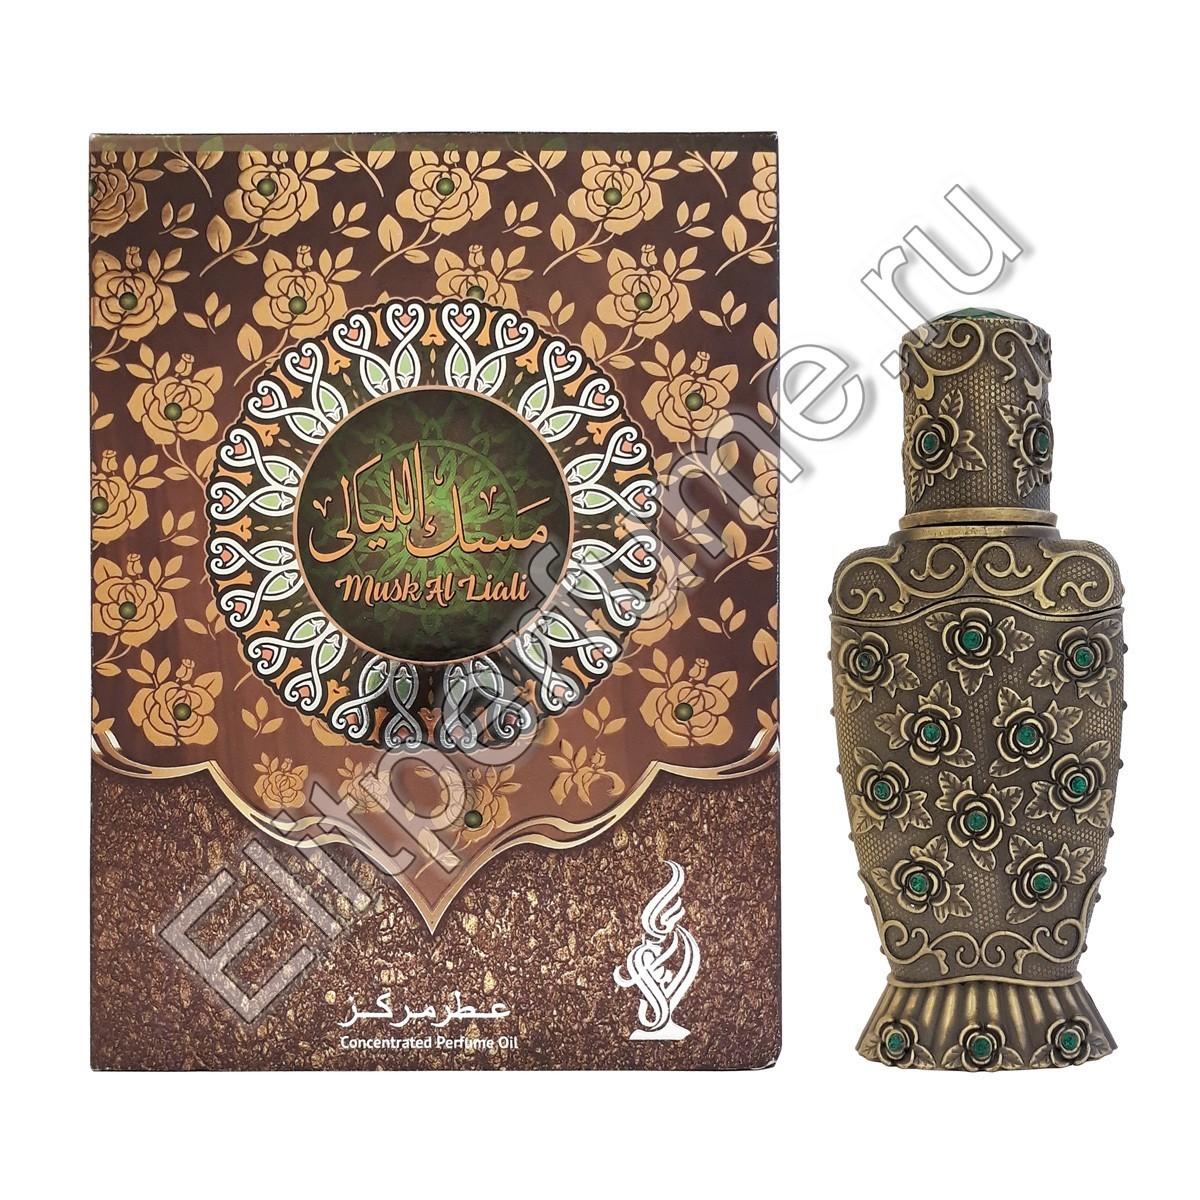 Musk al Liali / Муск аль Лиали 12 мл арабские масляные духи от Халис Khalis Perfumes